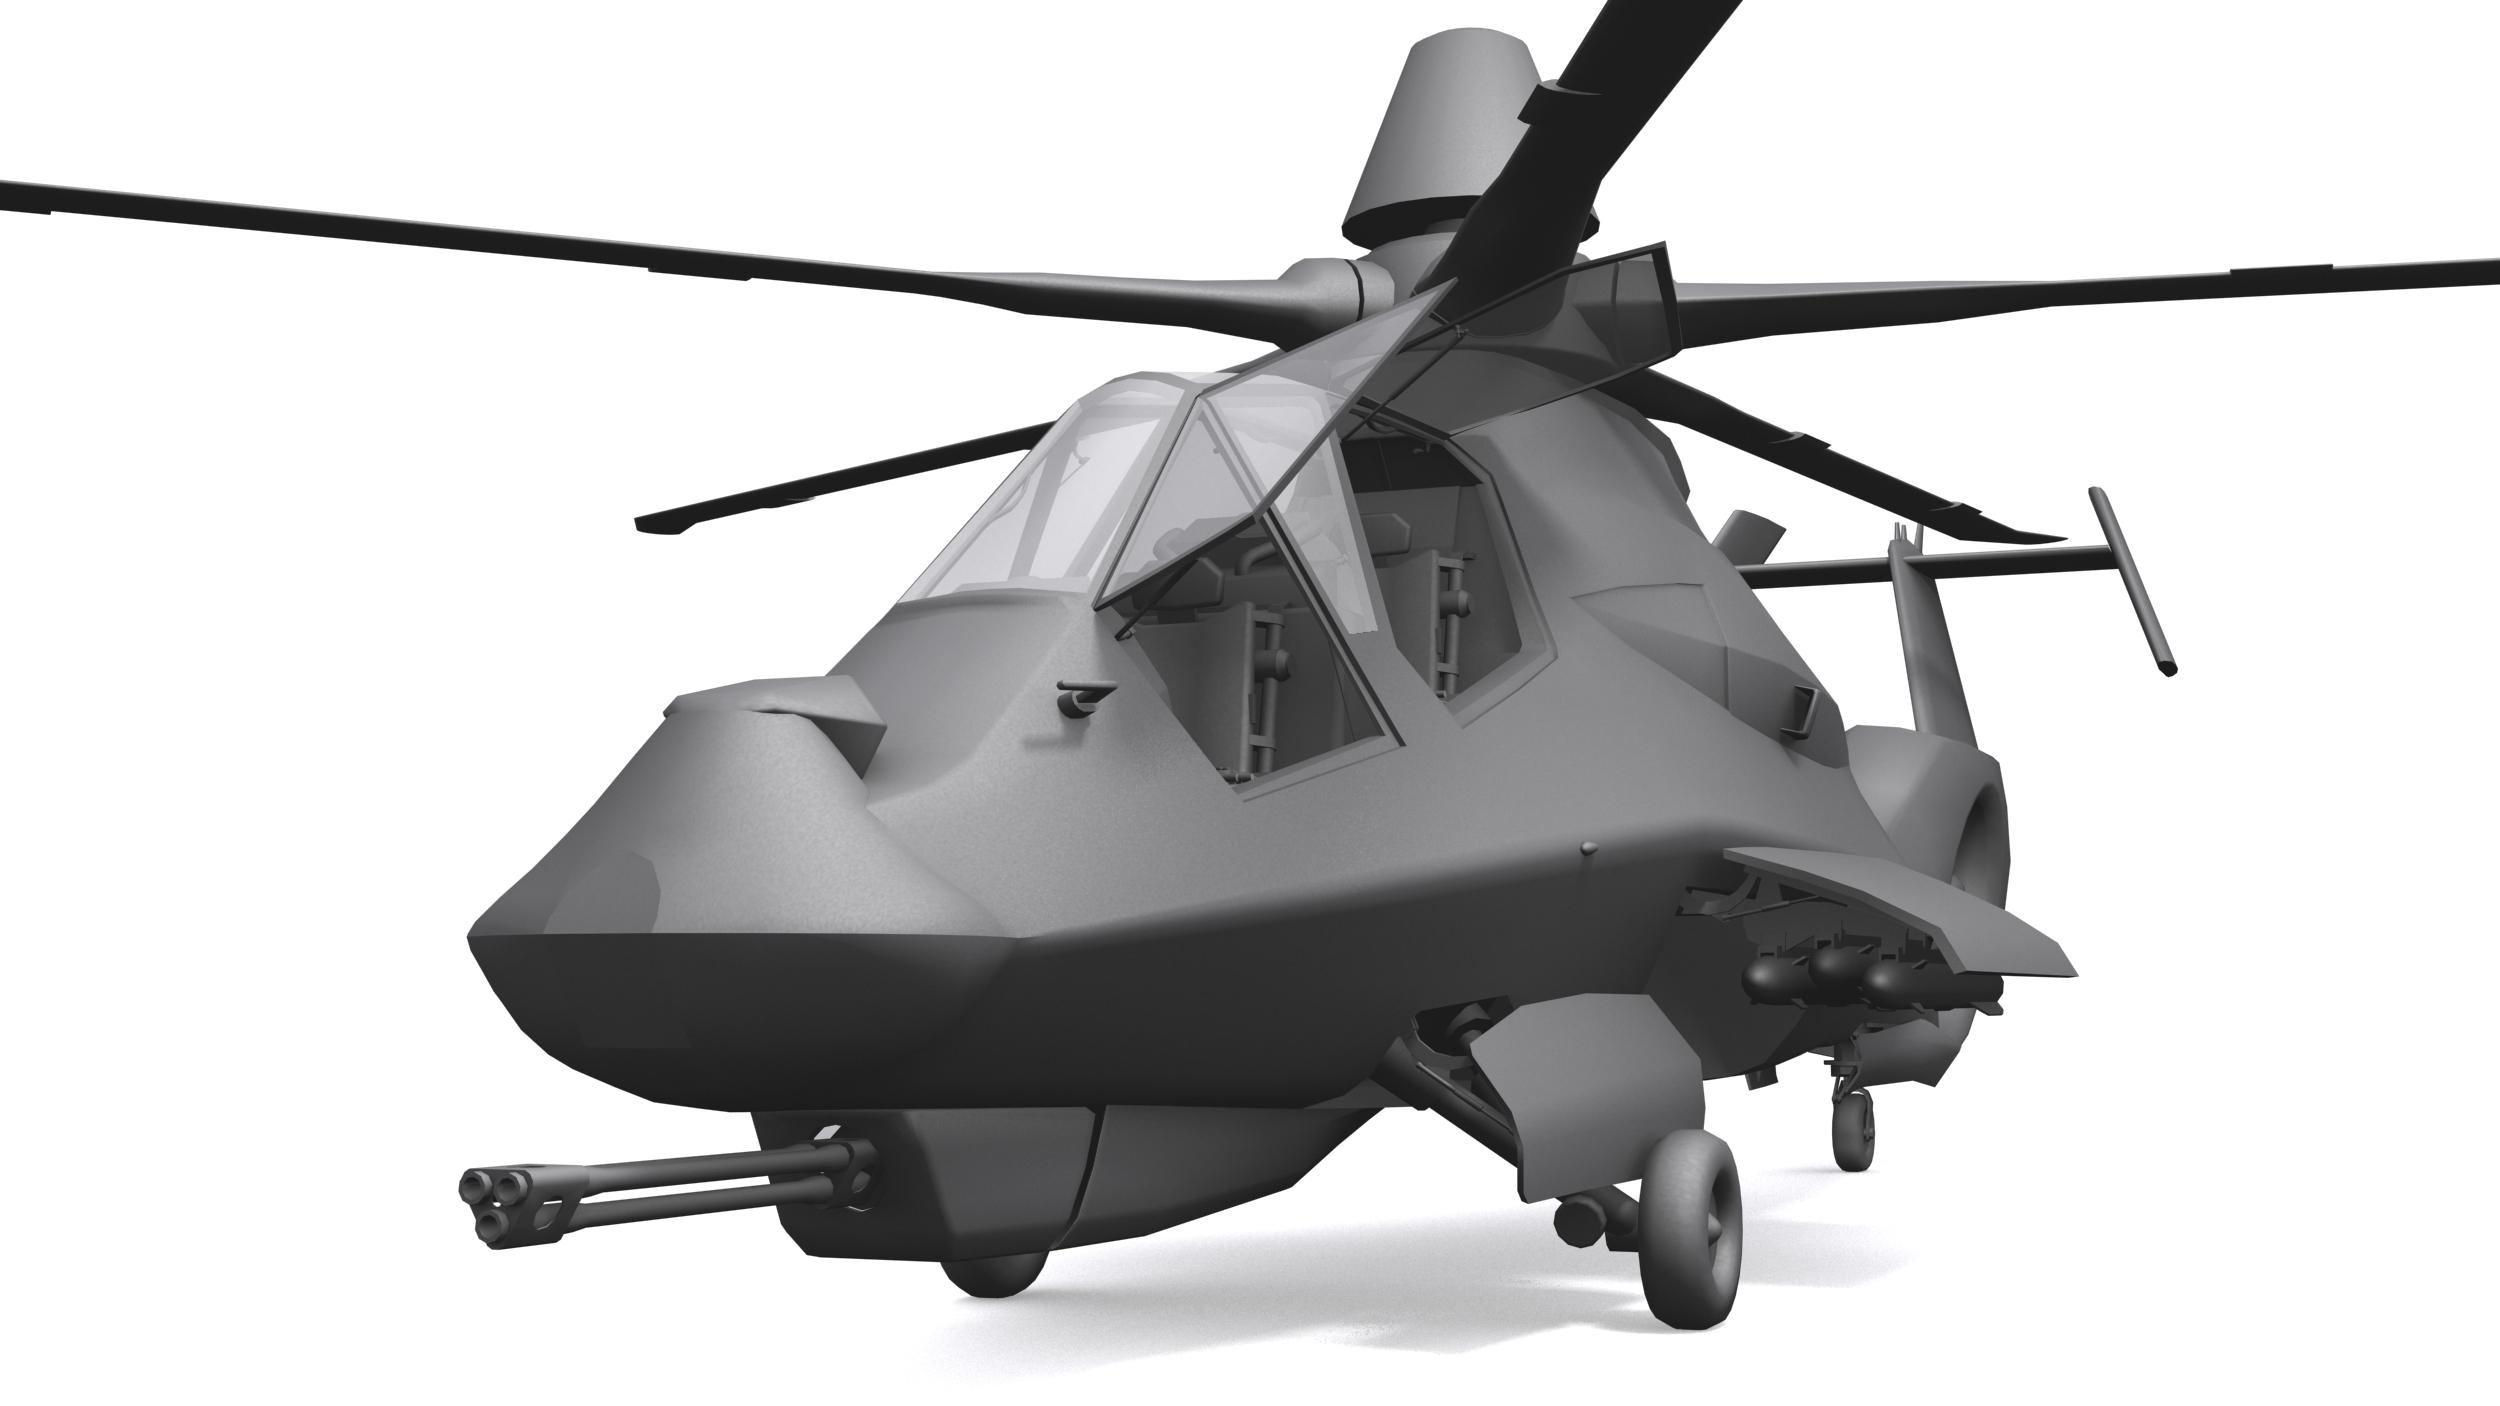 comanche, helicopter, фото, обои на рабочий стол